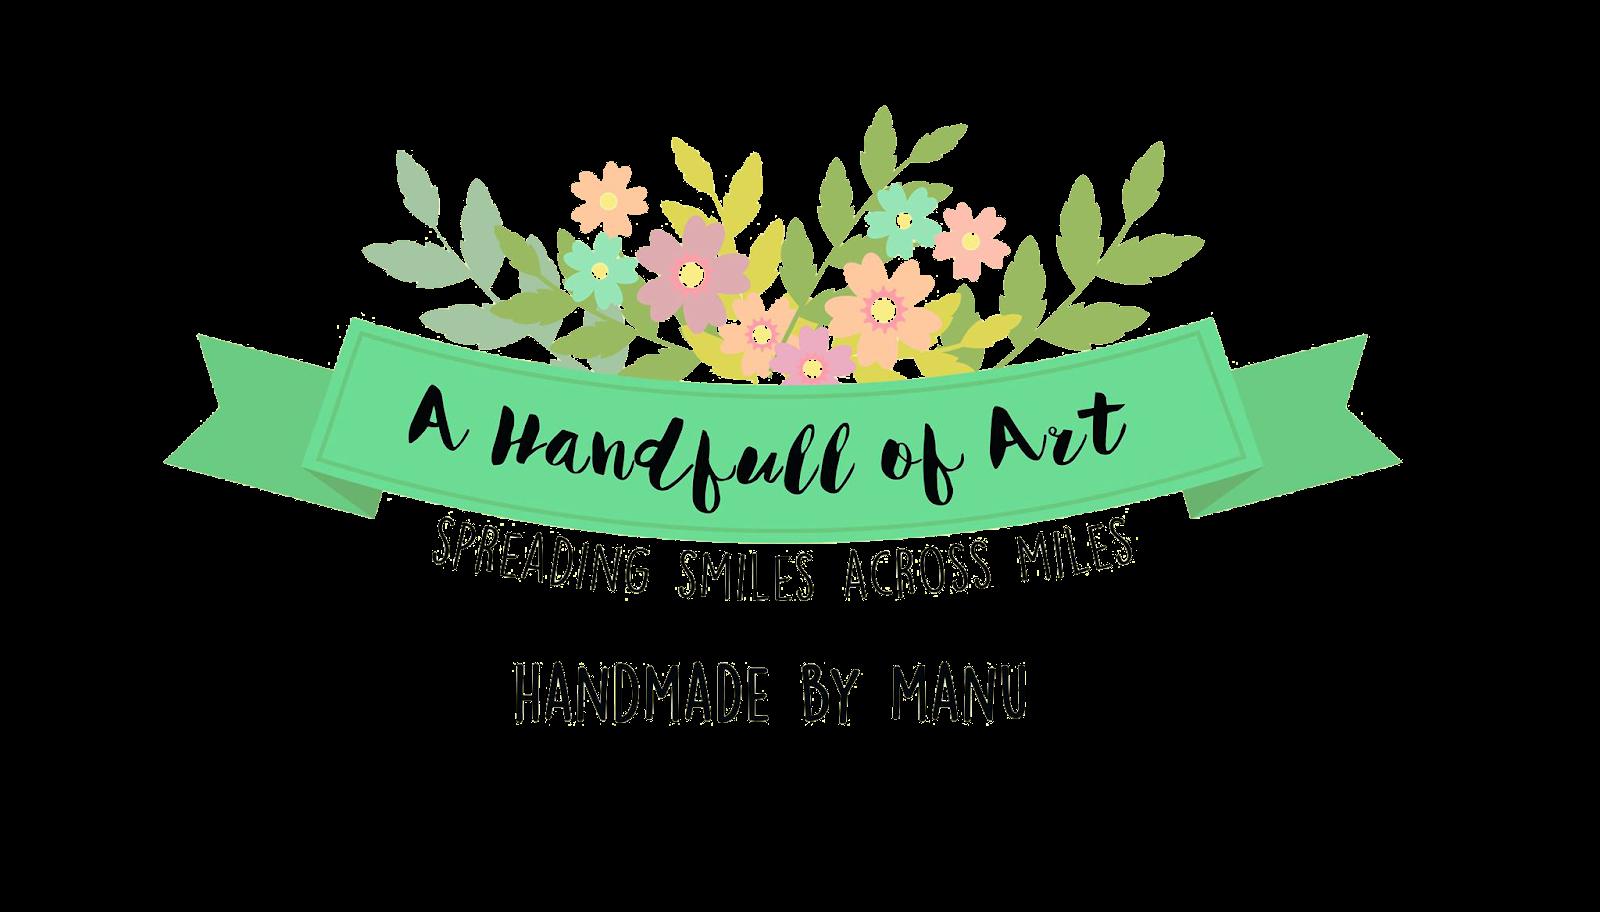 A Handfull of Art